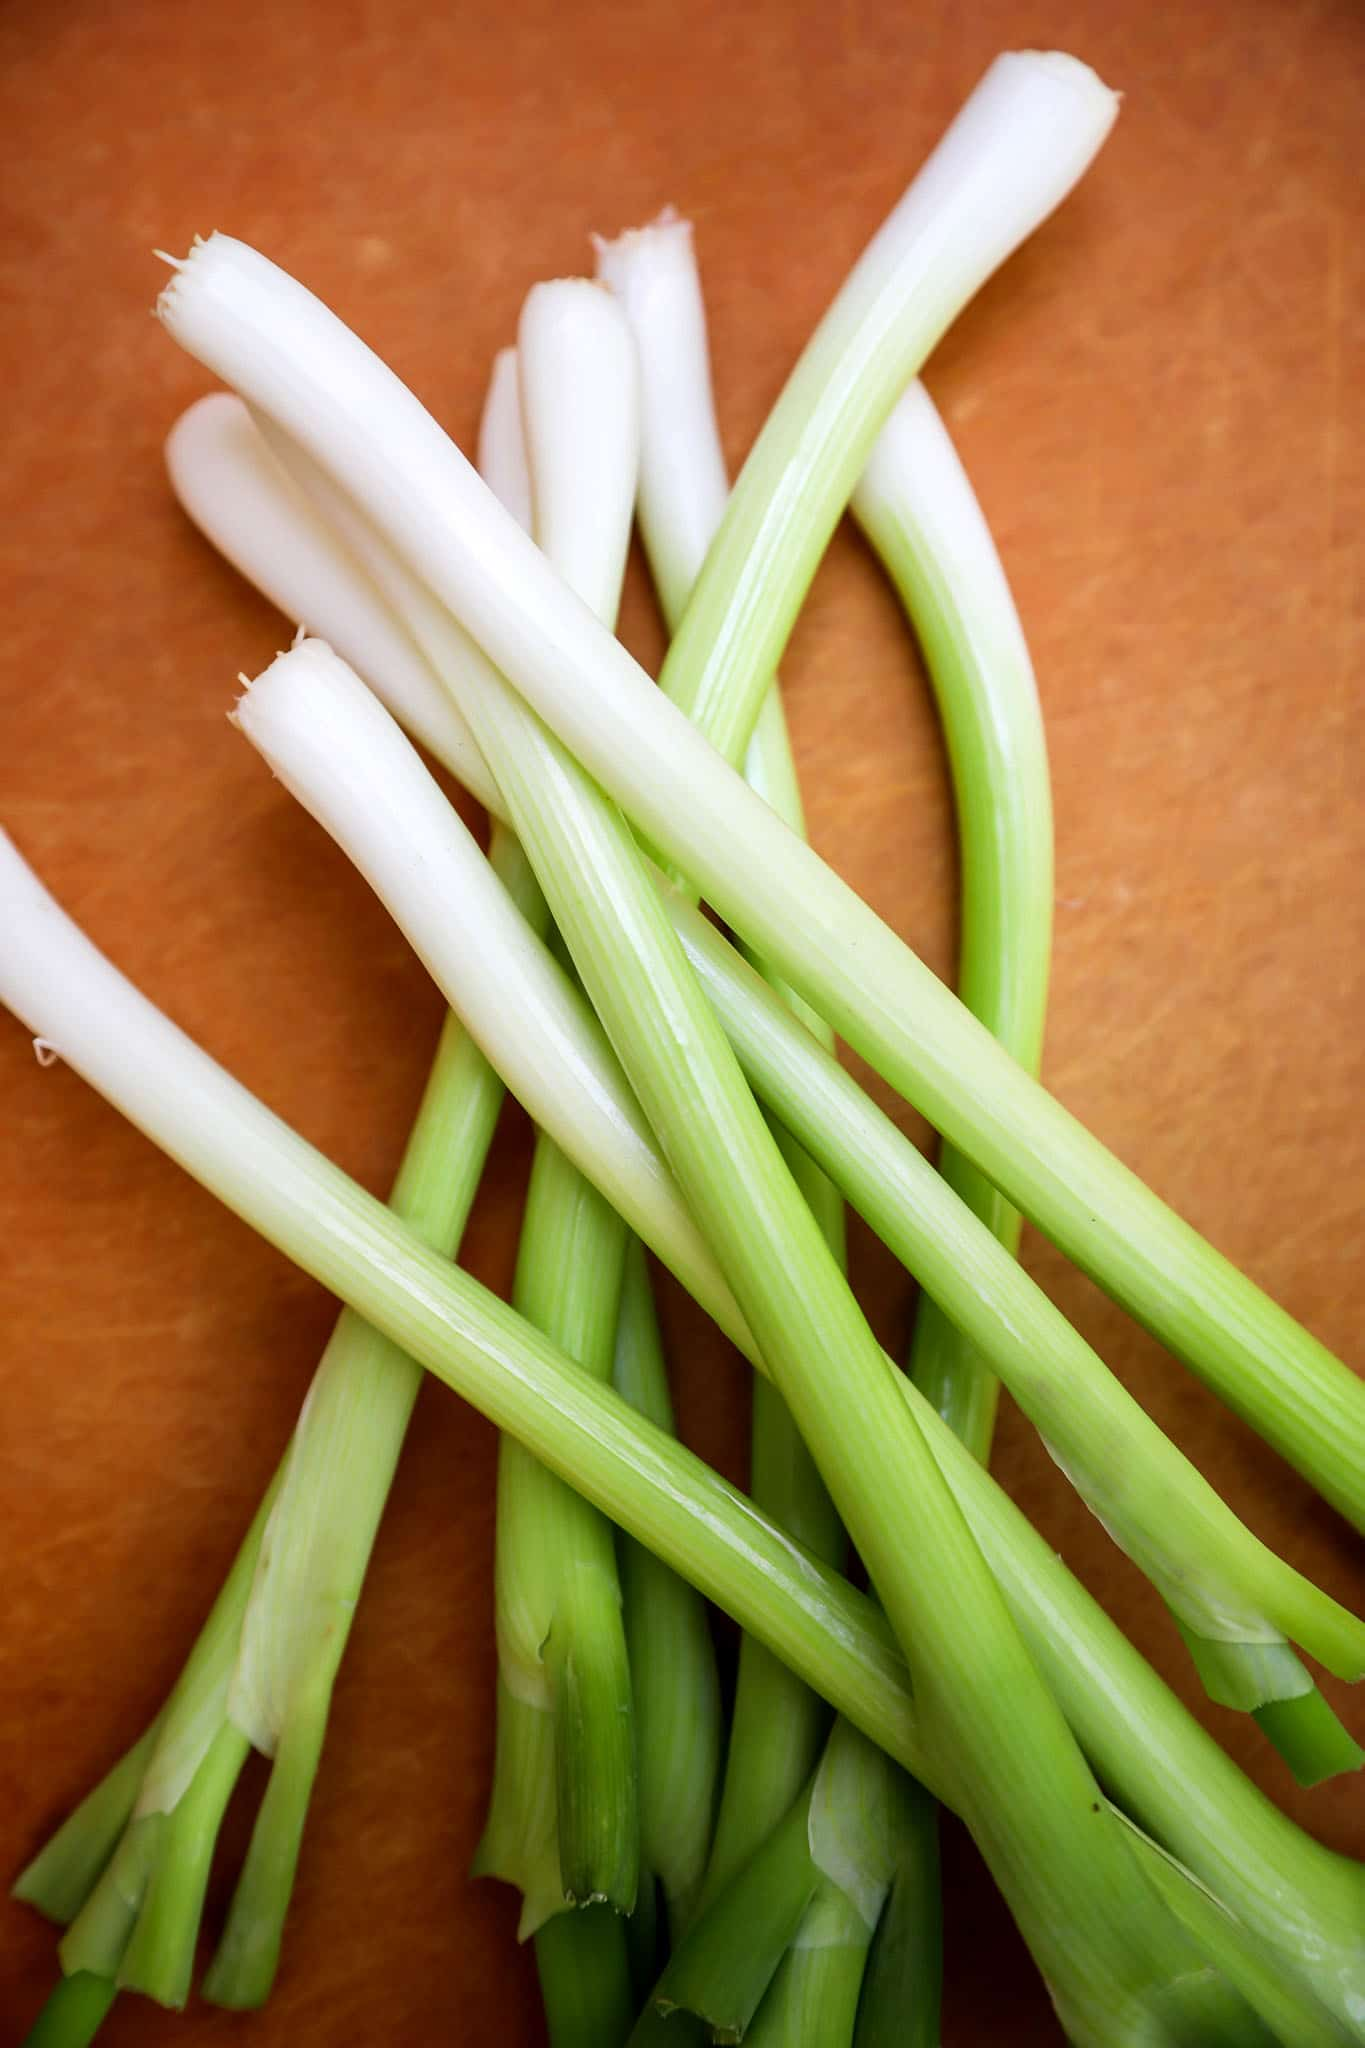 Scallions_vs_Green_Onions_3